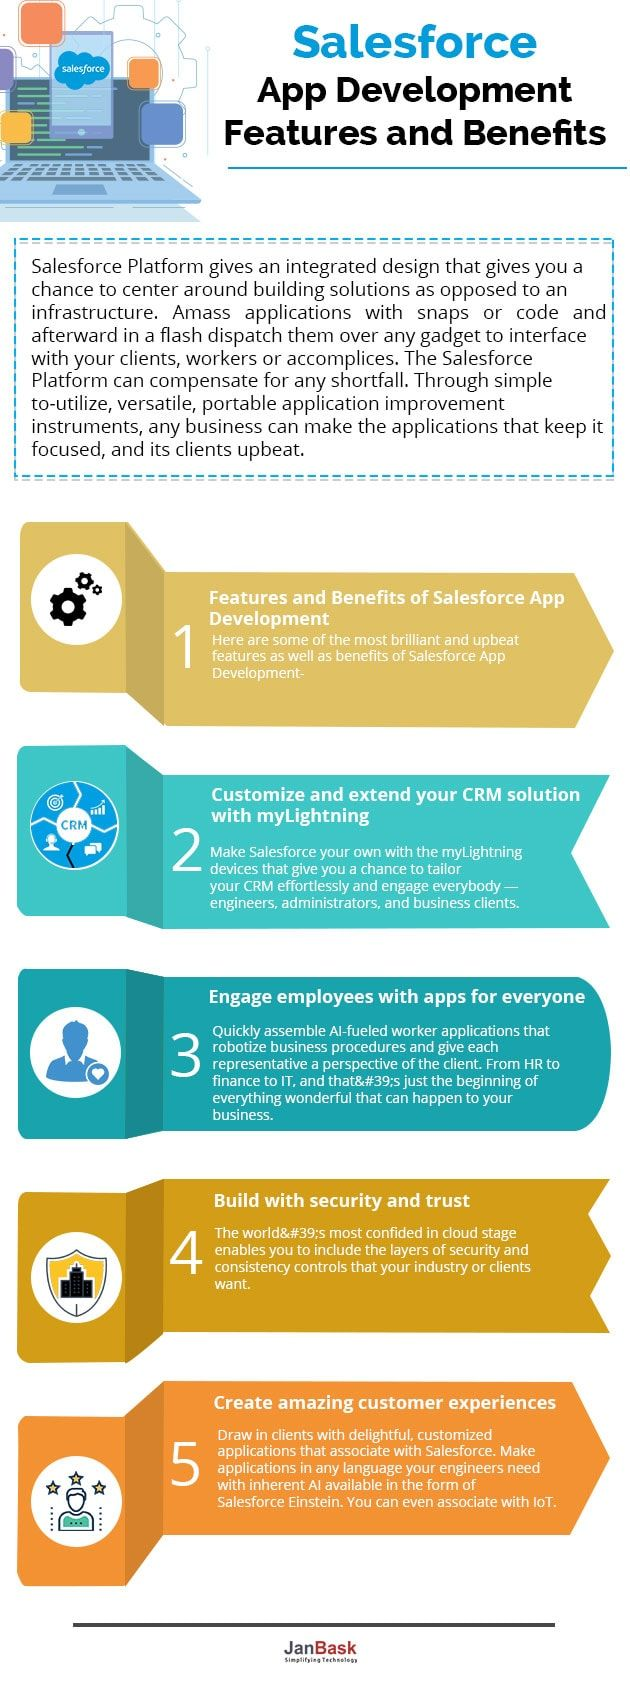 Salesforce Platform gives an integrated design that gives